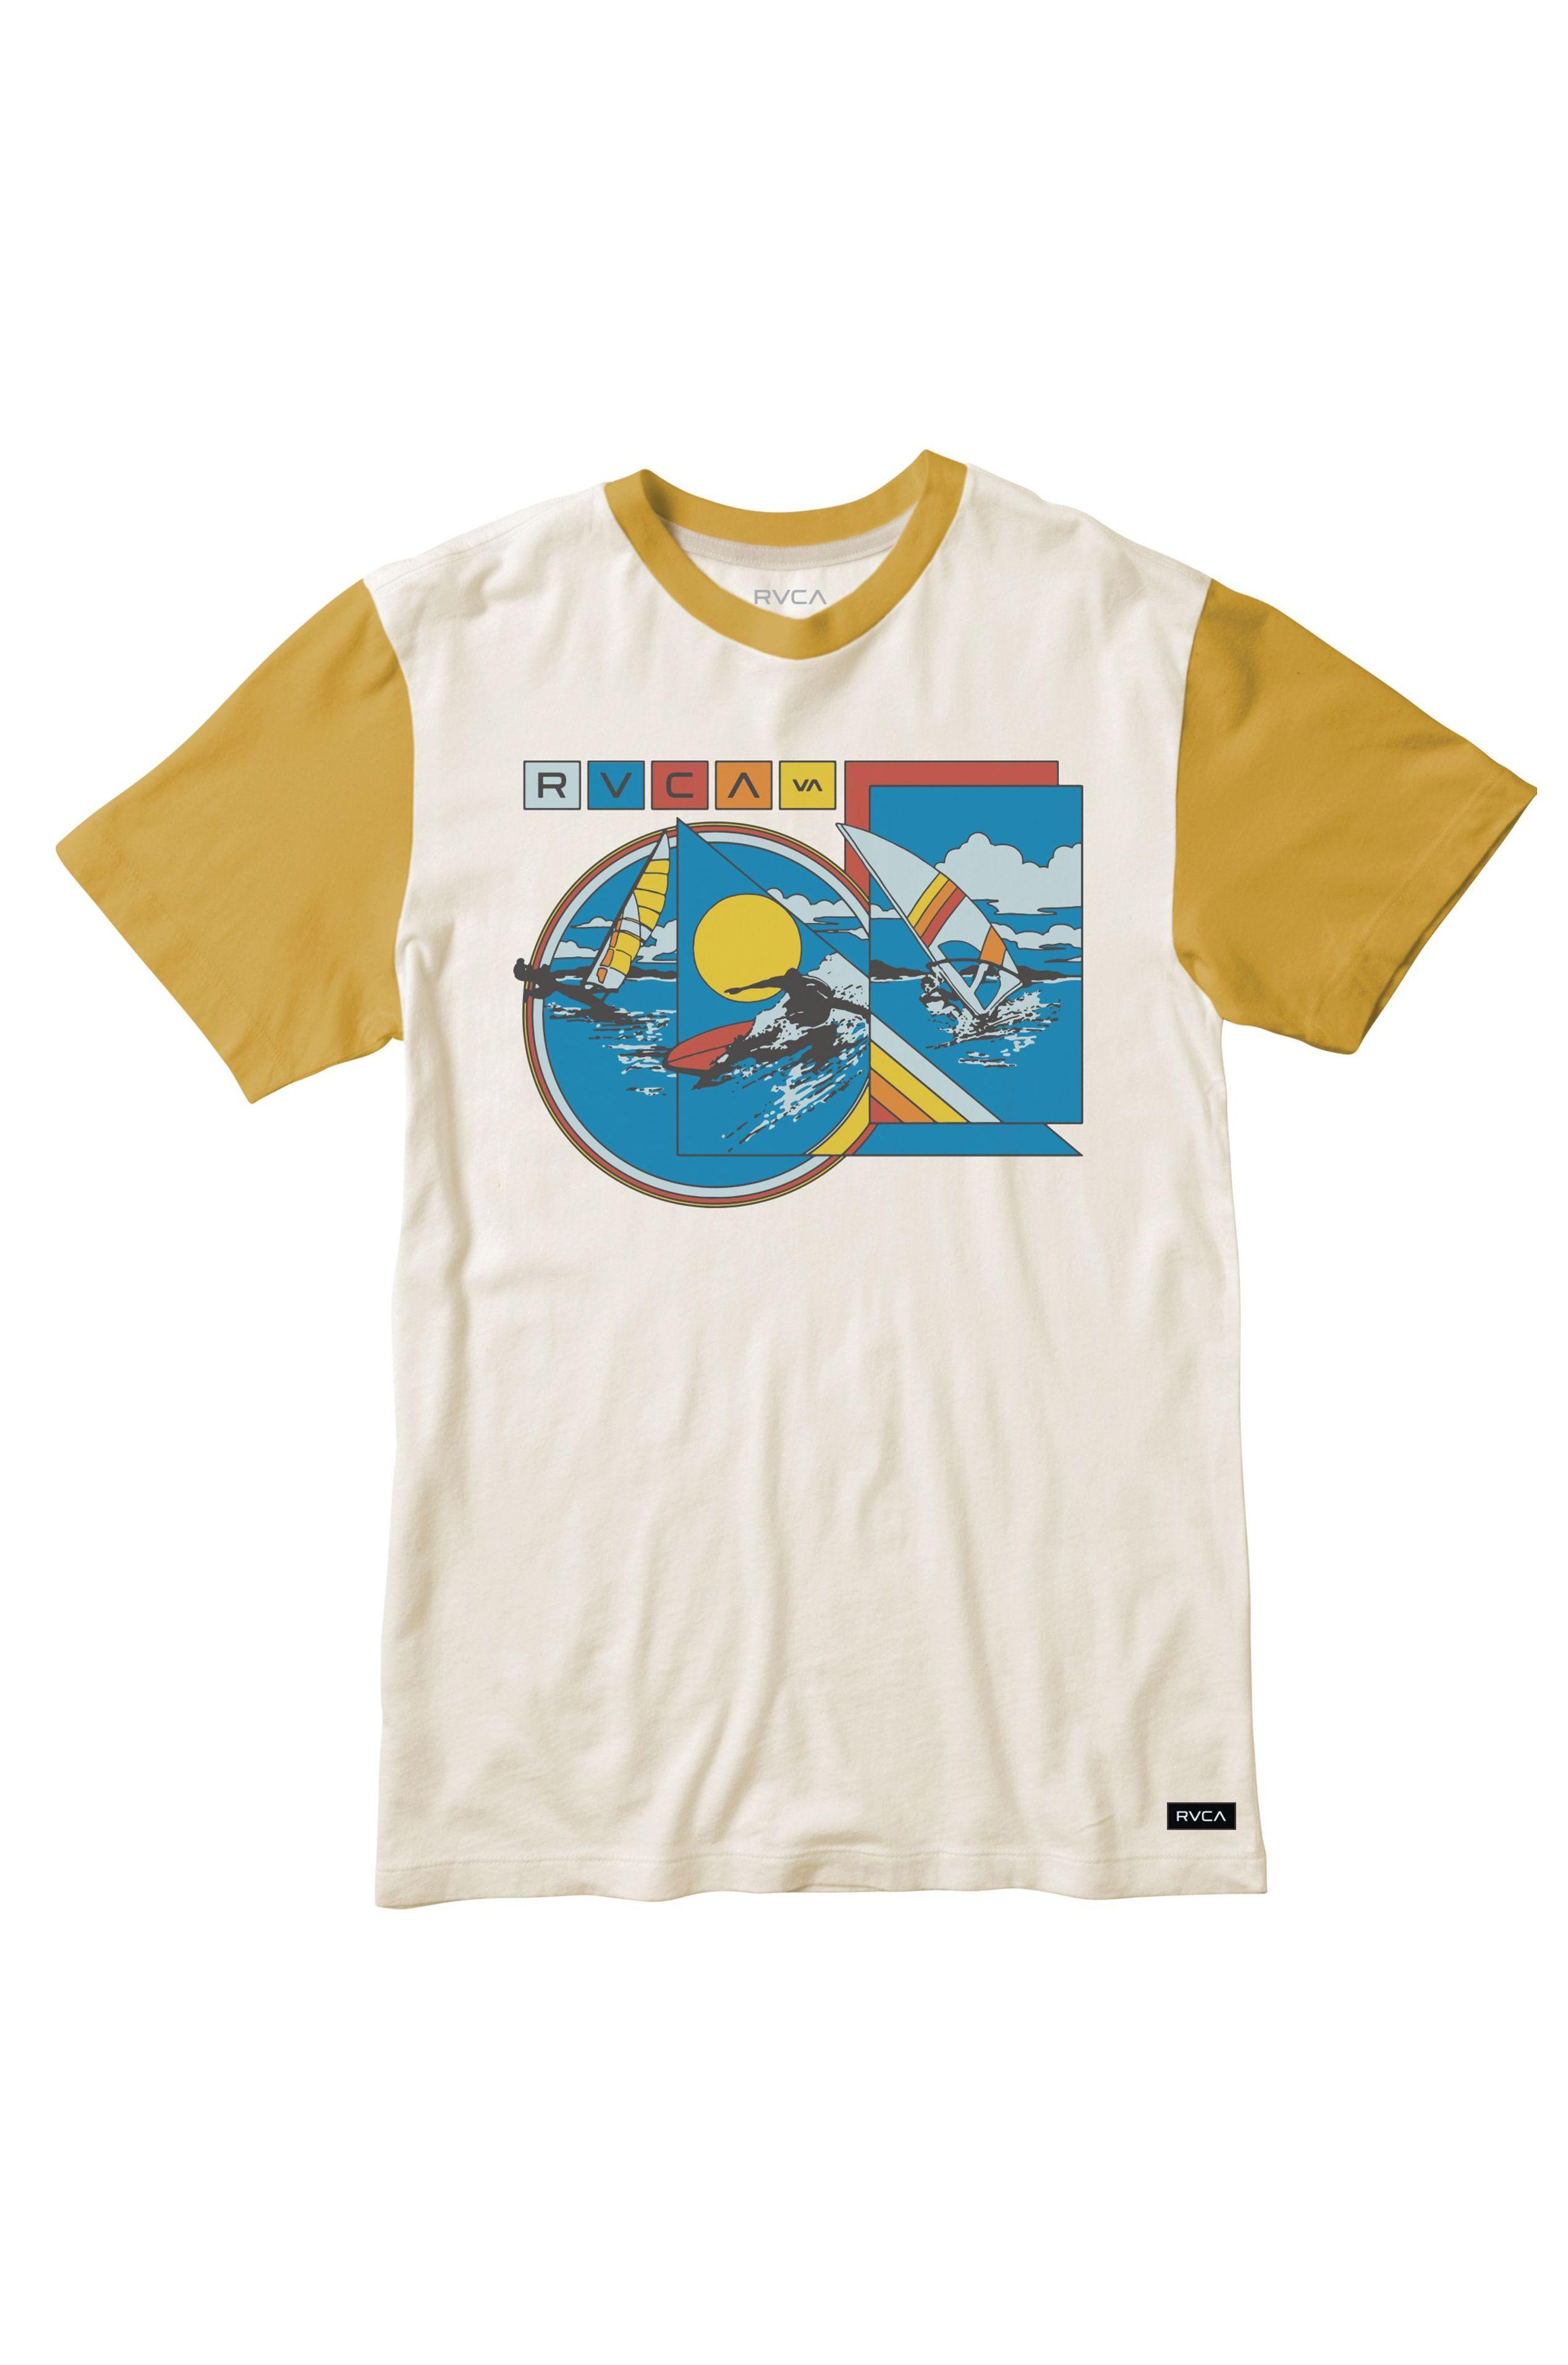 T-Shirt RVCA EVAN MOCK TOURIST BL EVAN MOCK Antique White